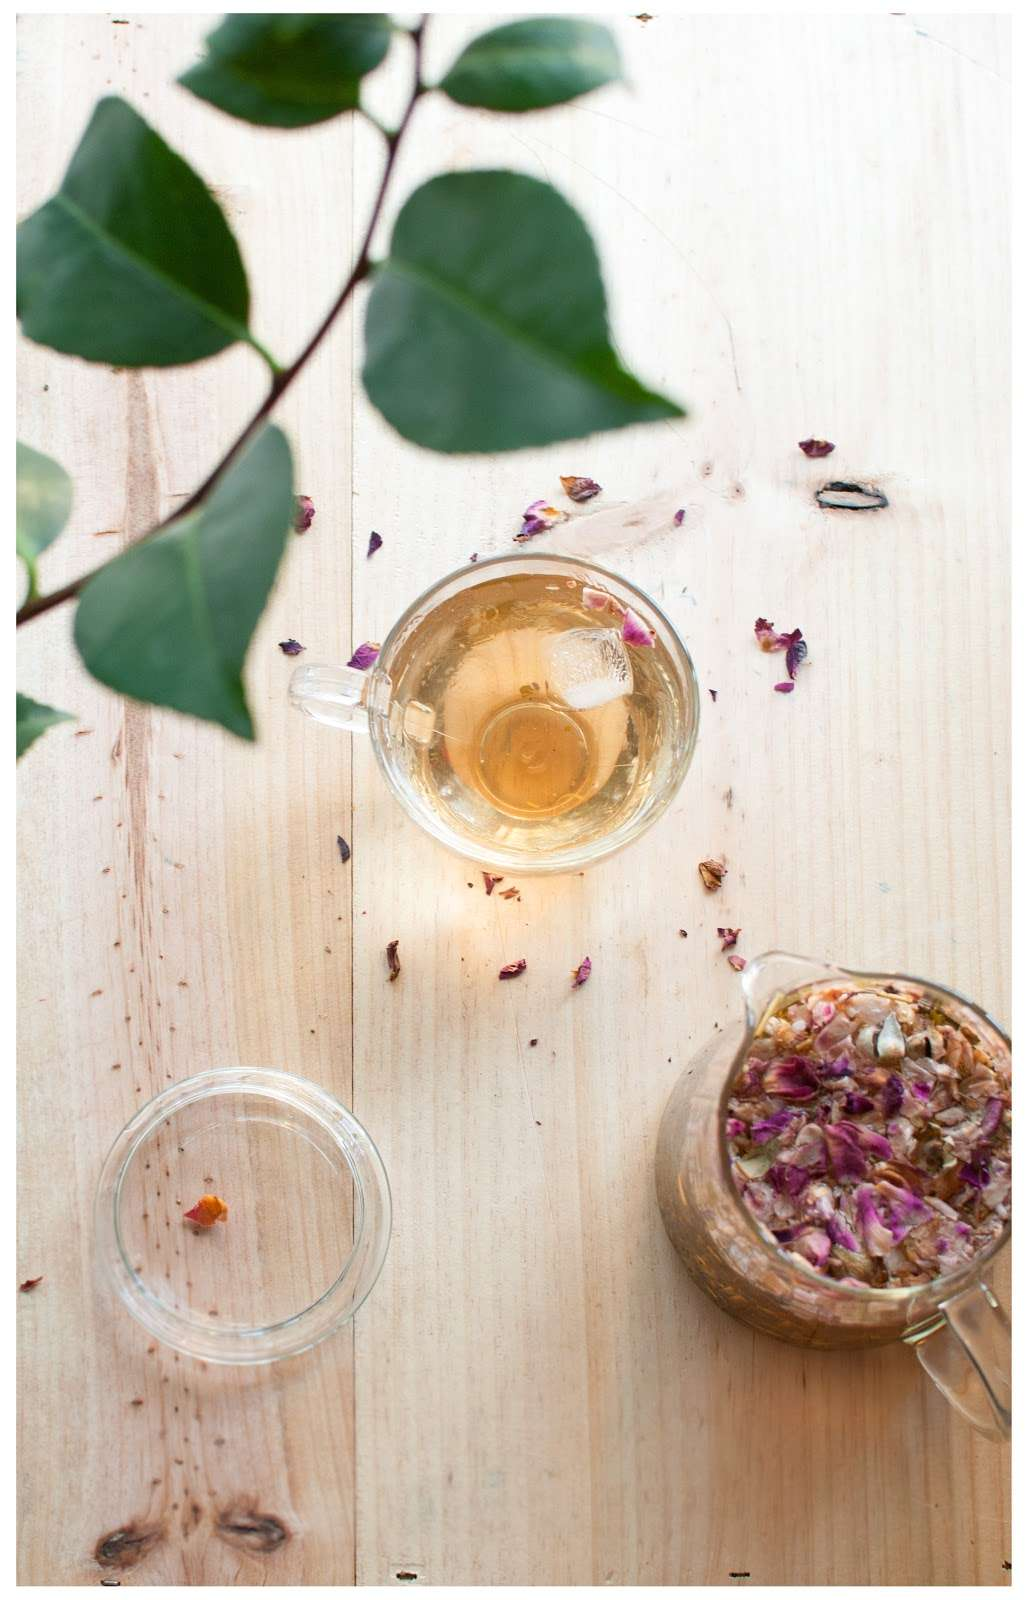 Tea Blending: Rose Petals and Tea Leaves